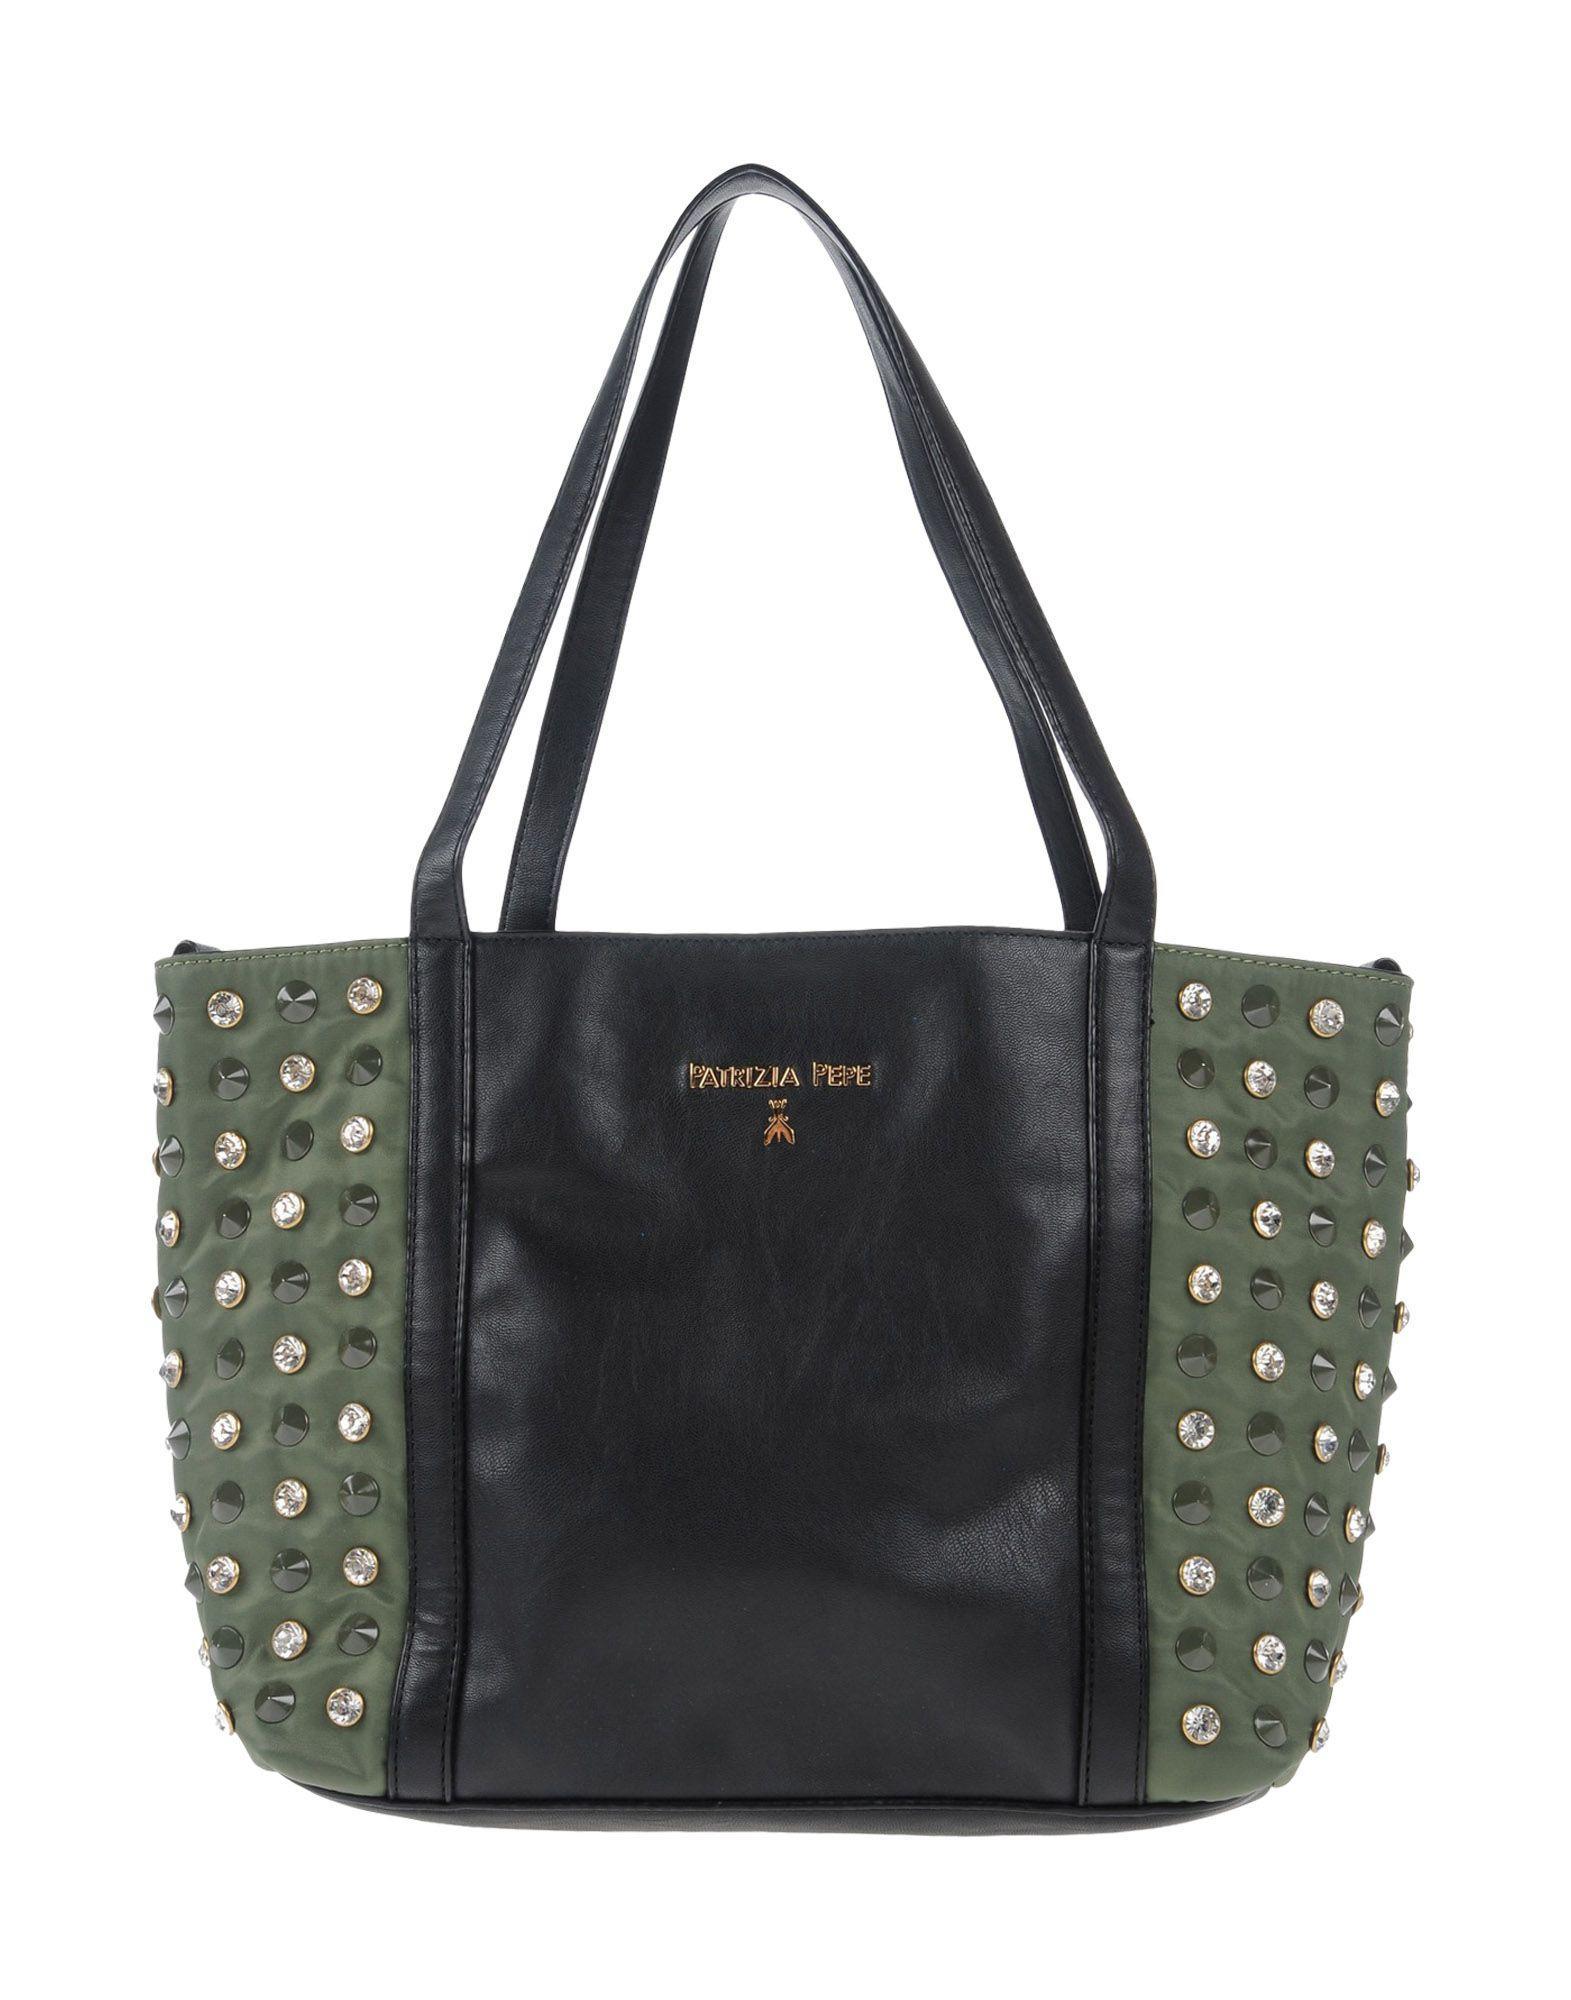 Patrizia Pepe Handbags In Black